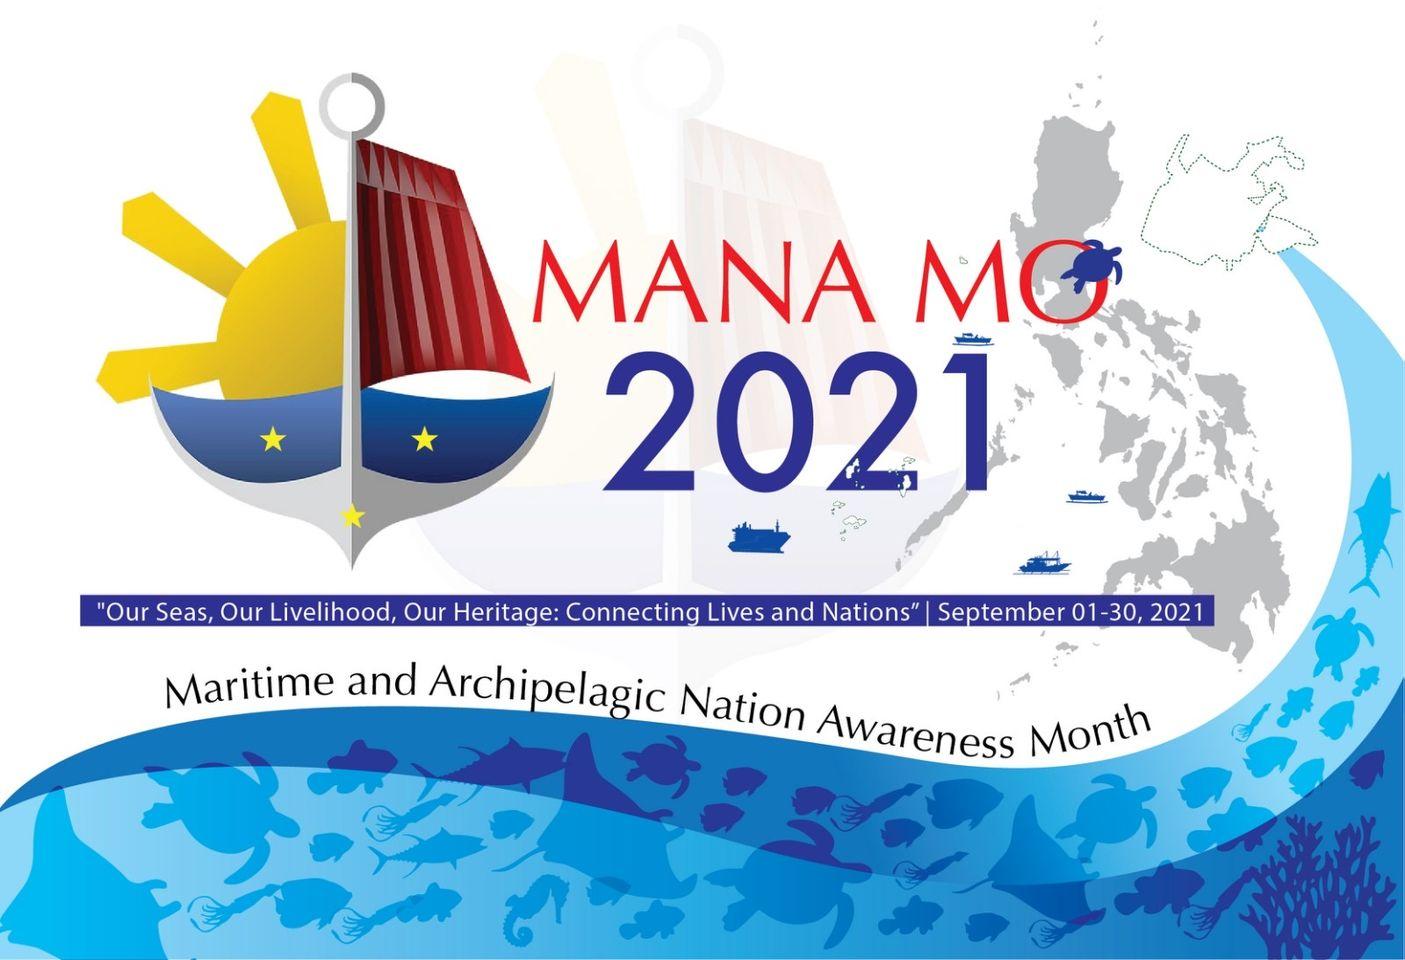 September is Maritime and Archipelagic Nation Awareness Month (MANA Mo) 2021